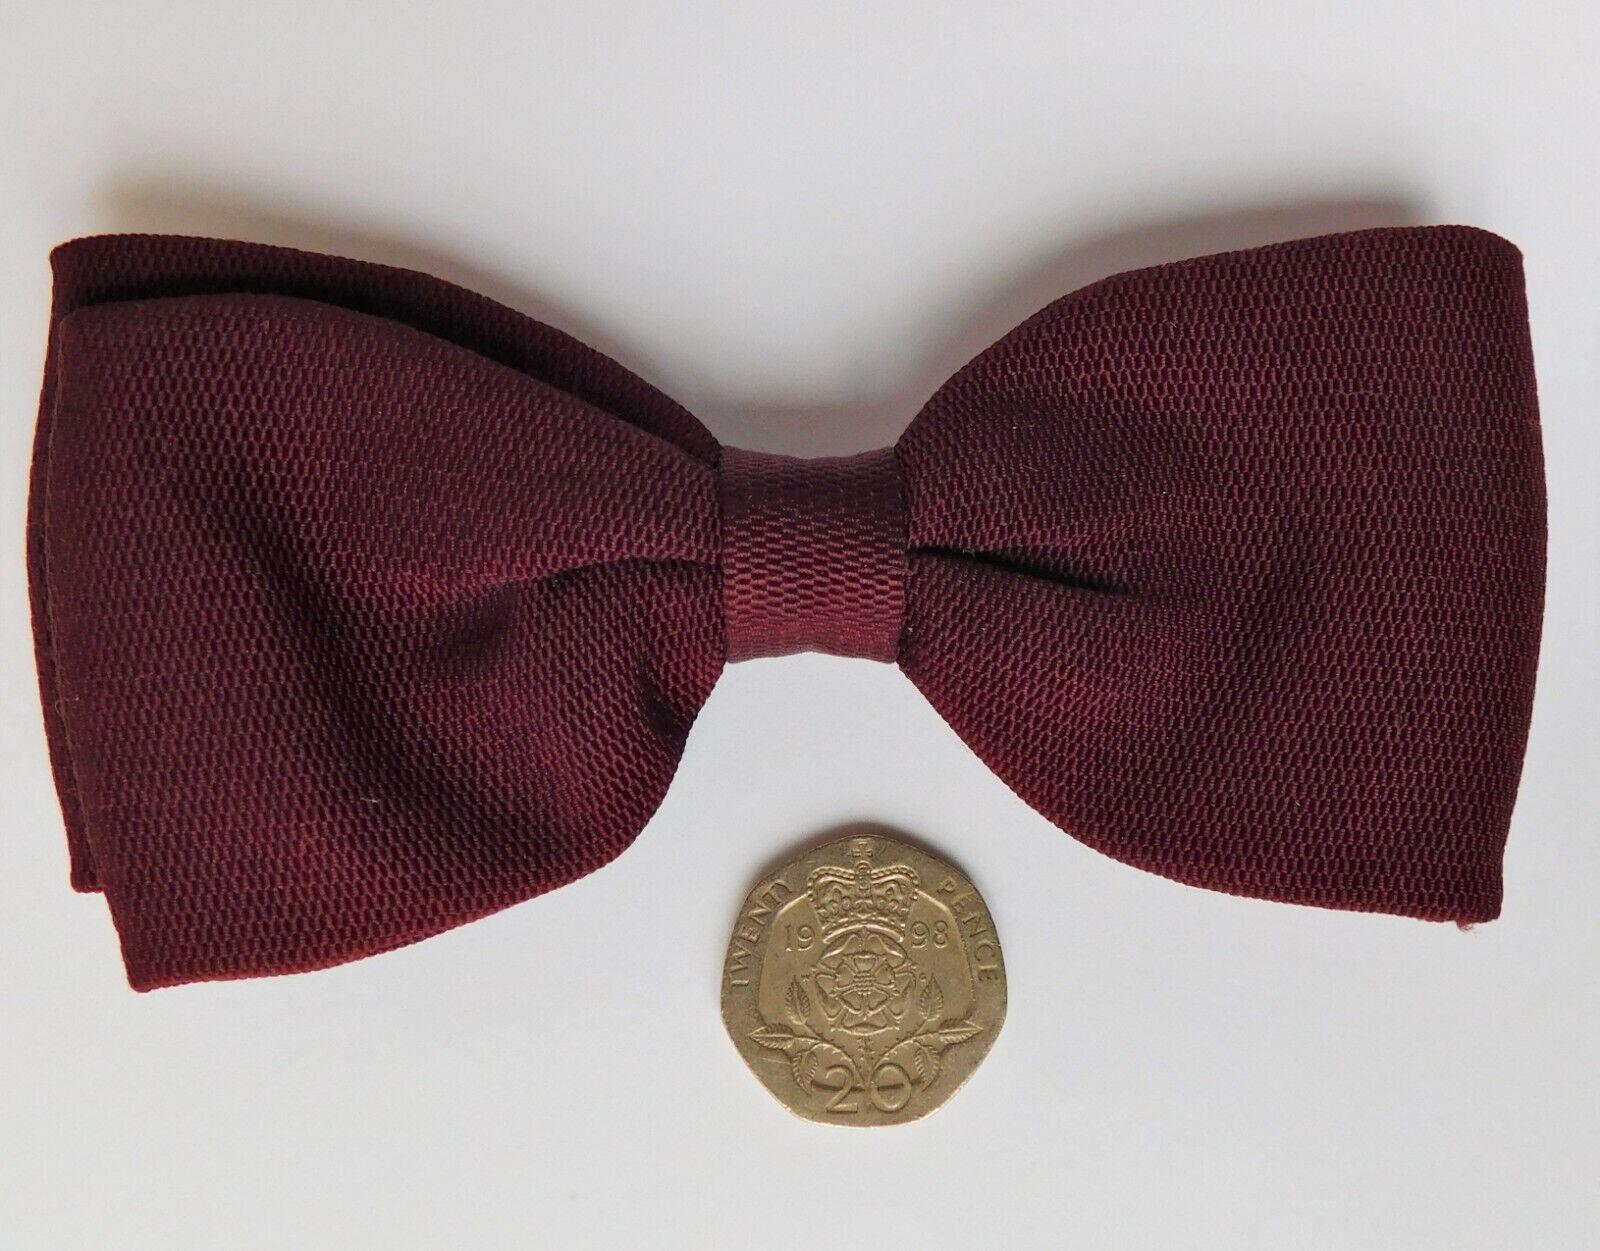 Burgundy Tenax bow tie clip on vintage 1960s mens formal tuxedo dress wear boned